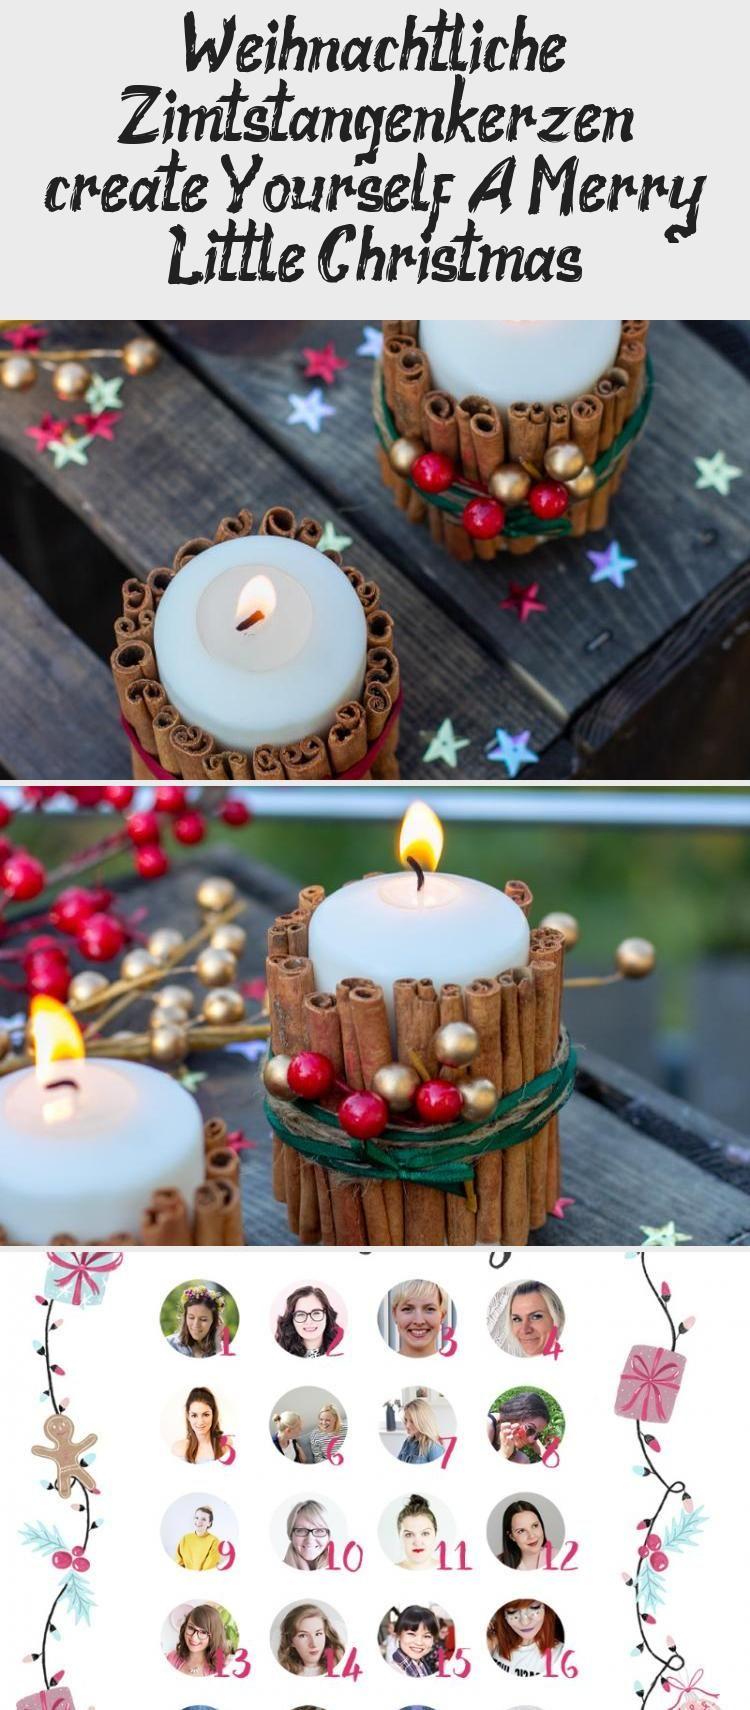 Weihnachtliche Zimtstangen Kerzen Create Yourself A Merry Little